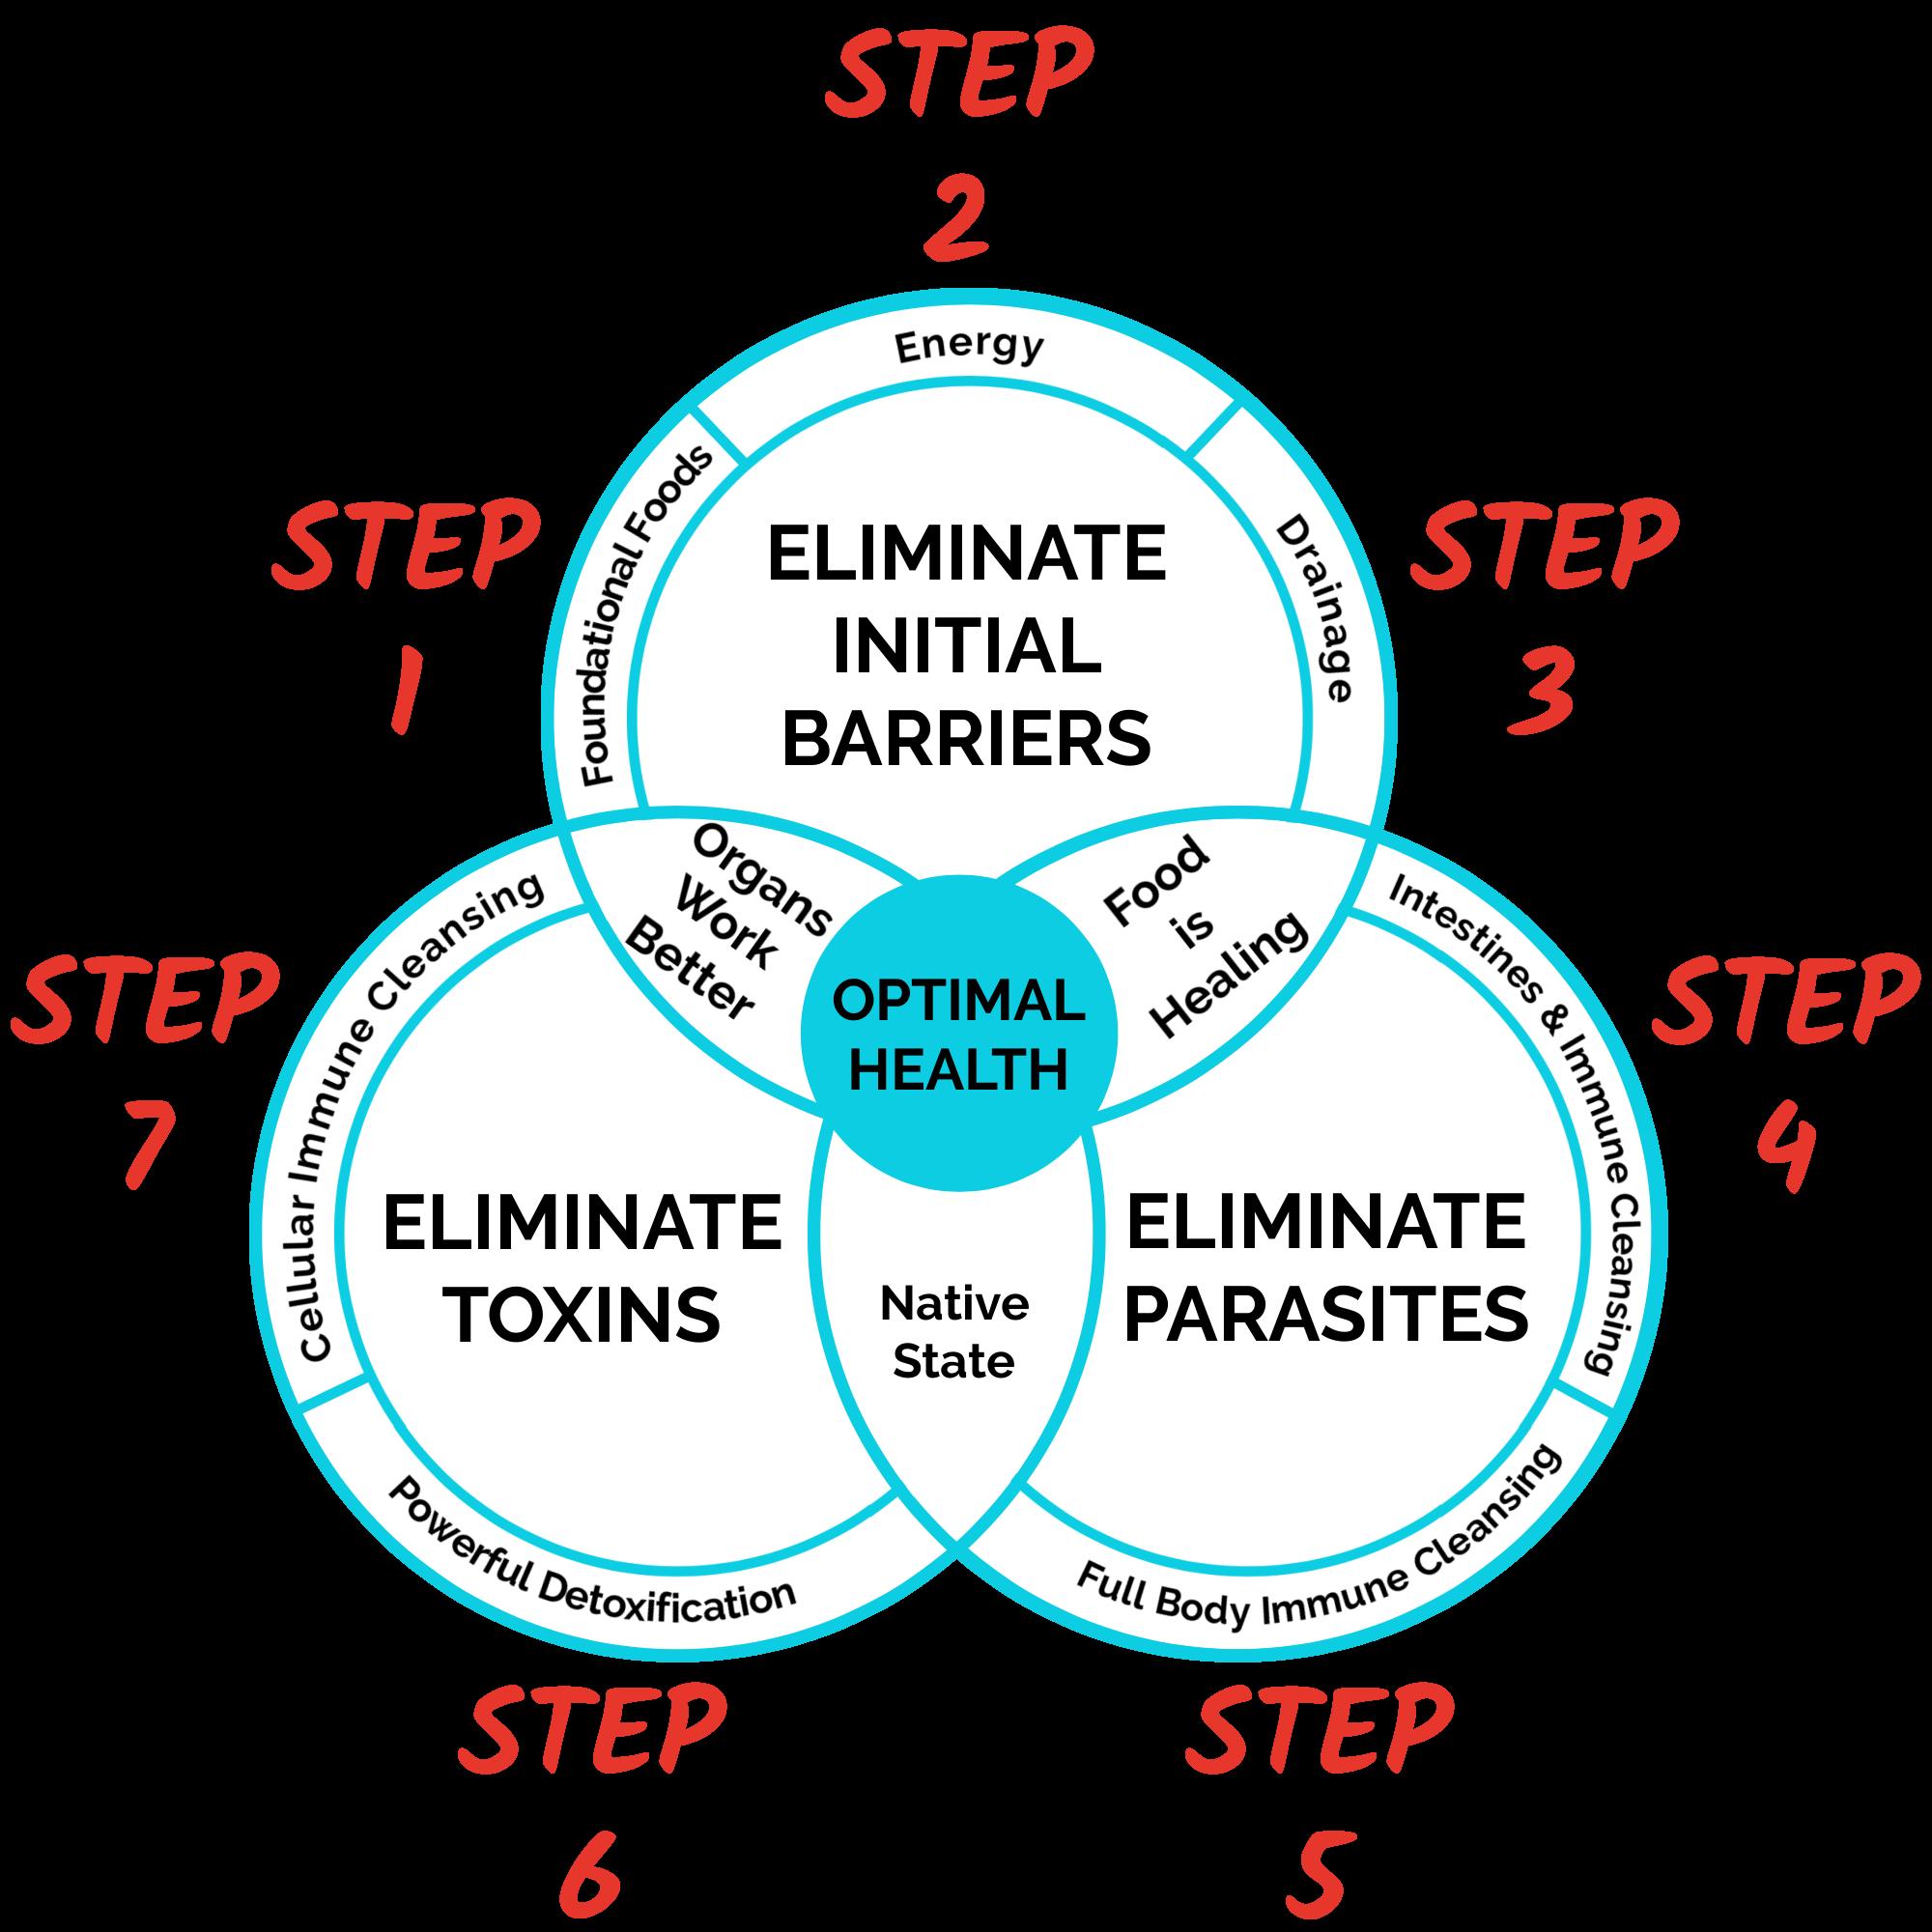 7 Step Blueprint To Optimal Health - 3 Pillars - Step numbers